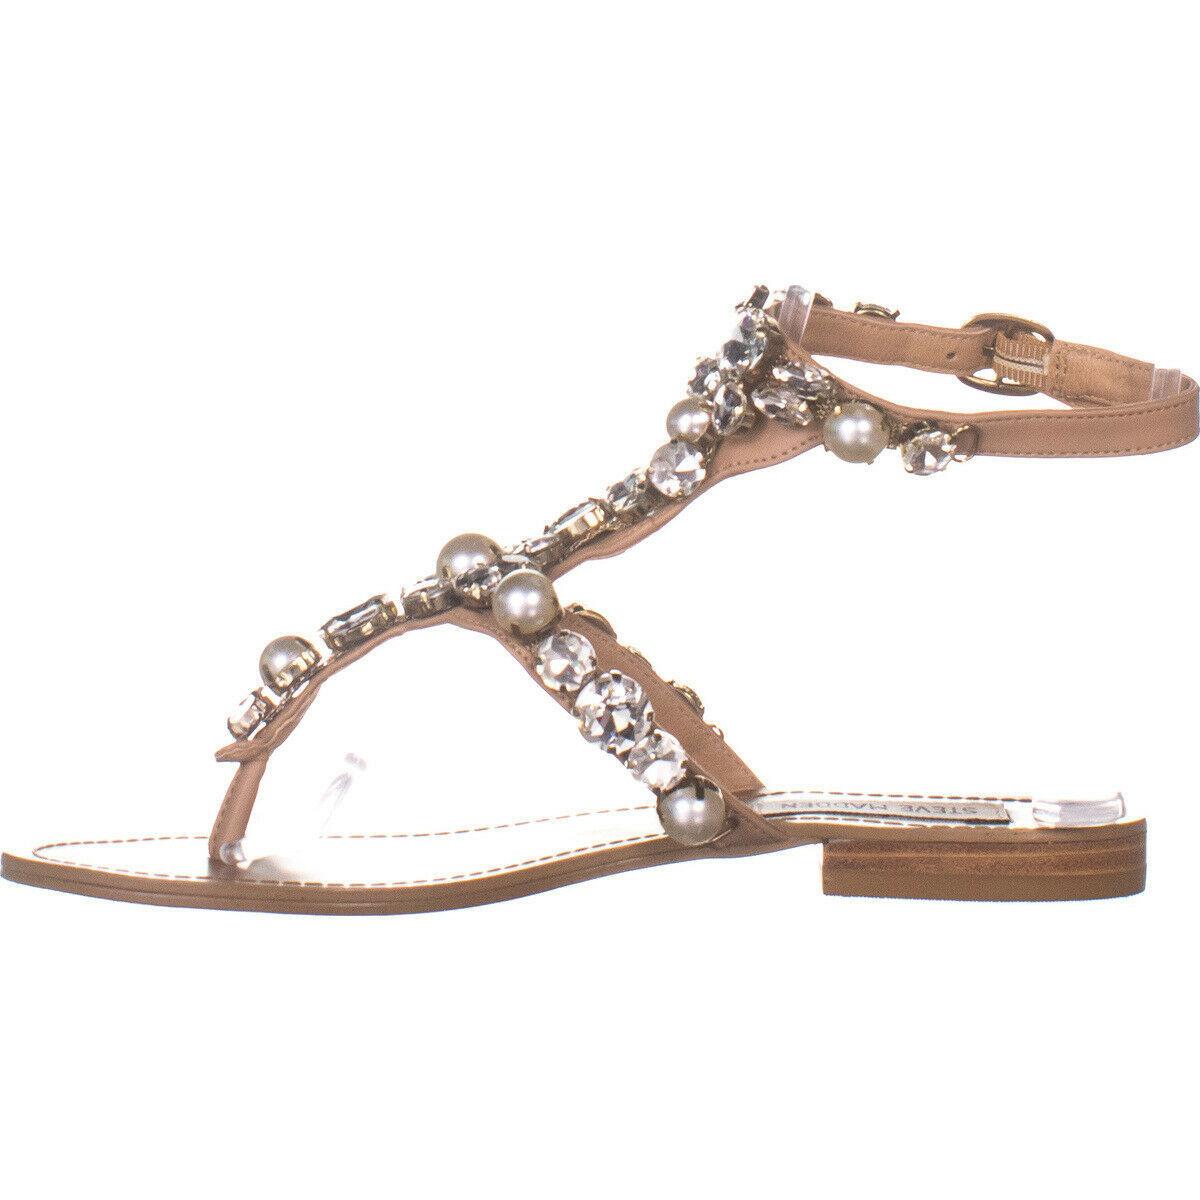 Steve Madden Chantel Flat Ankle Strap Sandals, Blush Multi 115, Blush Multi, 7 image 4